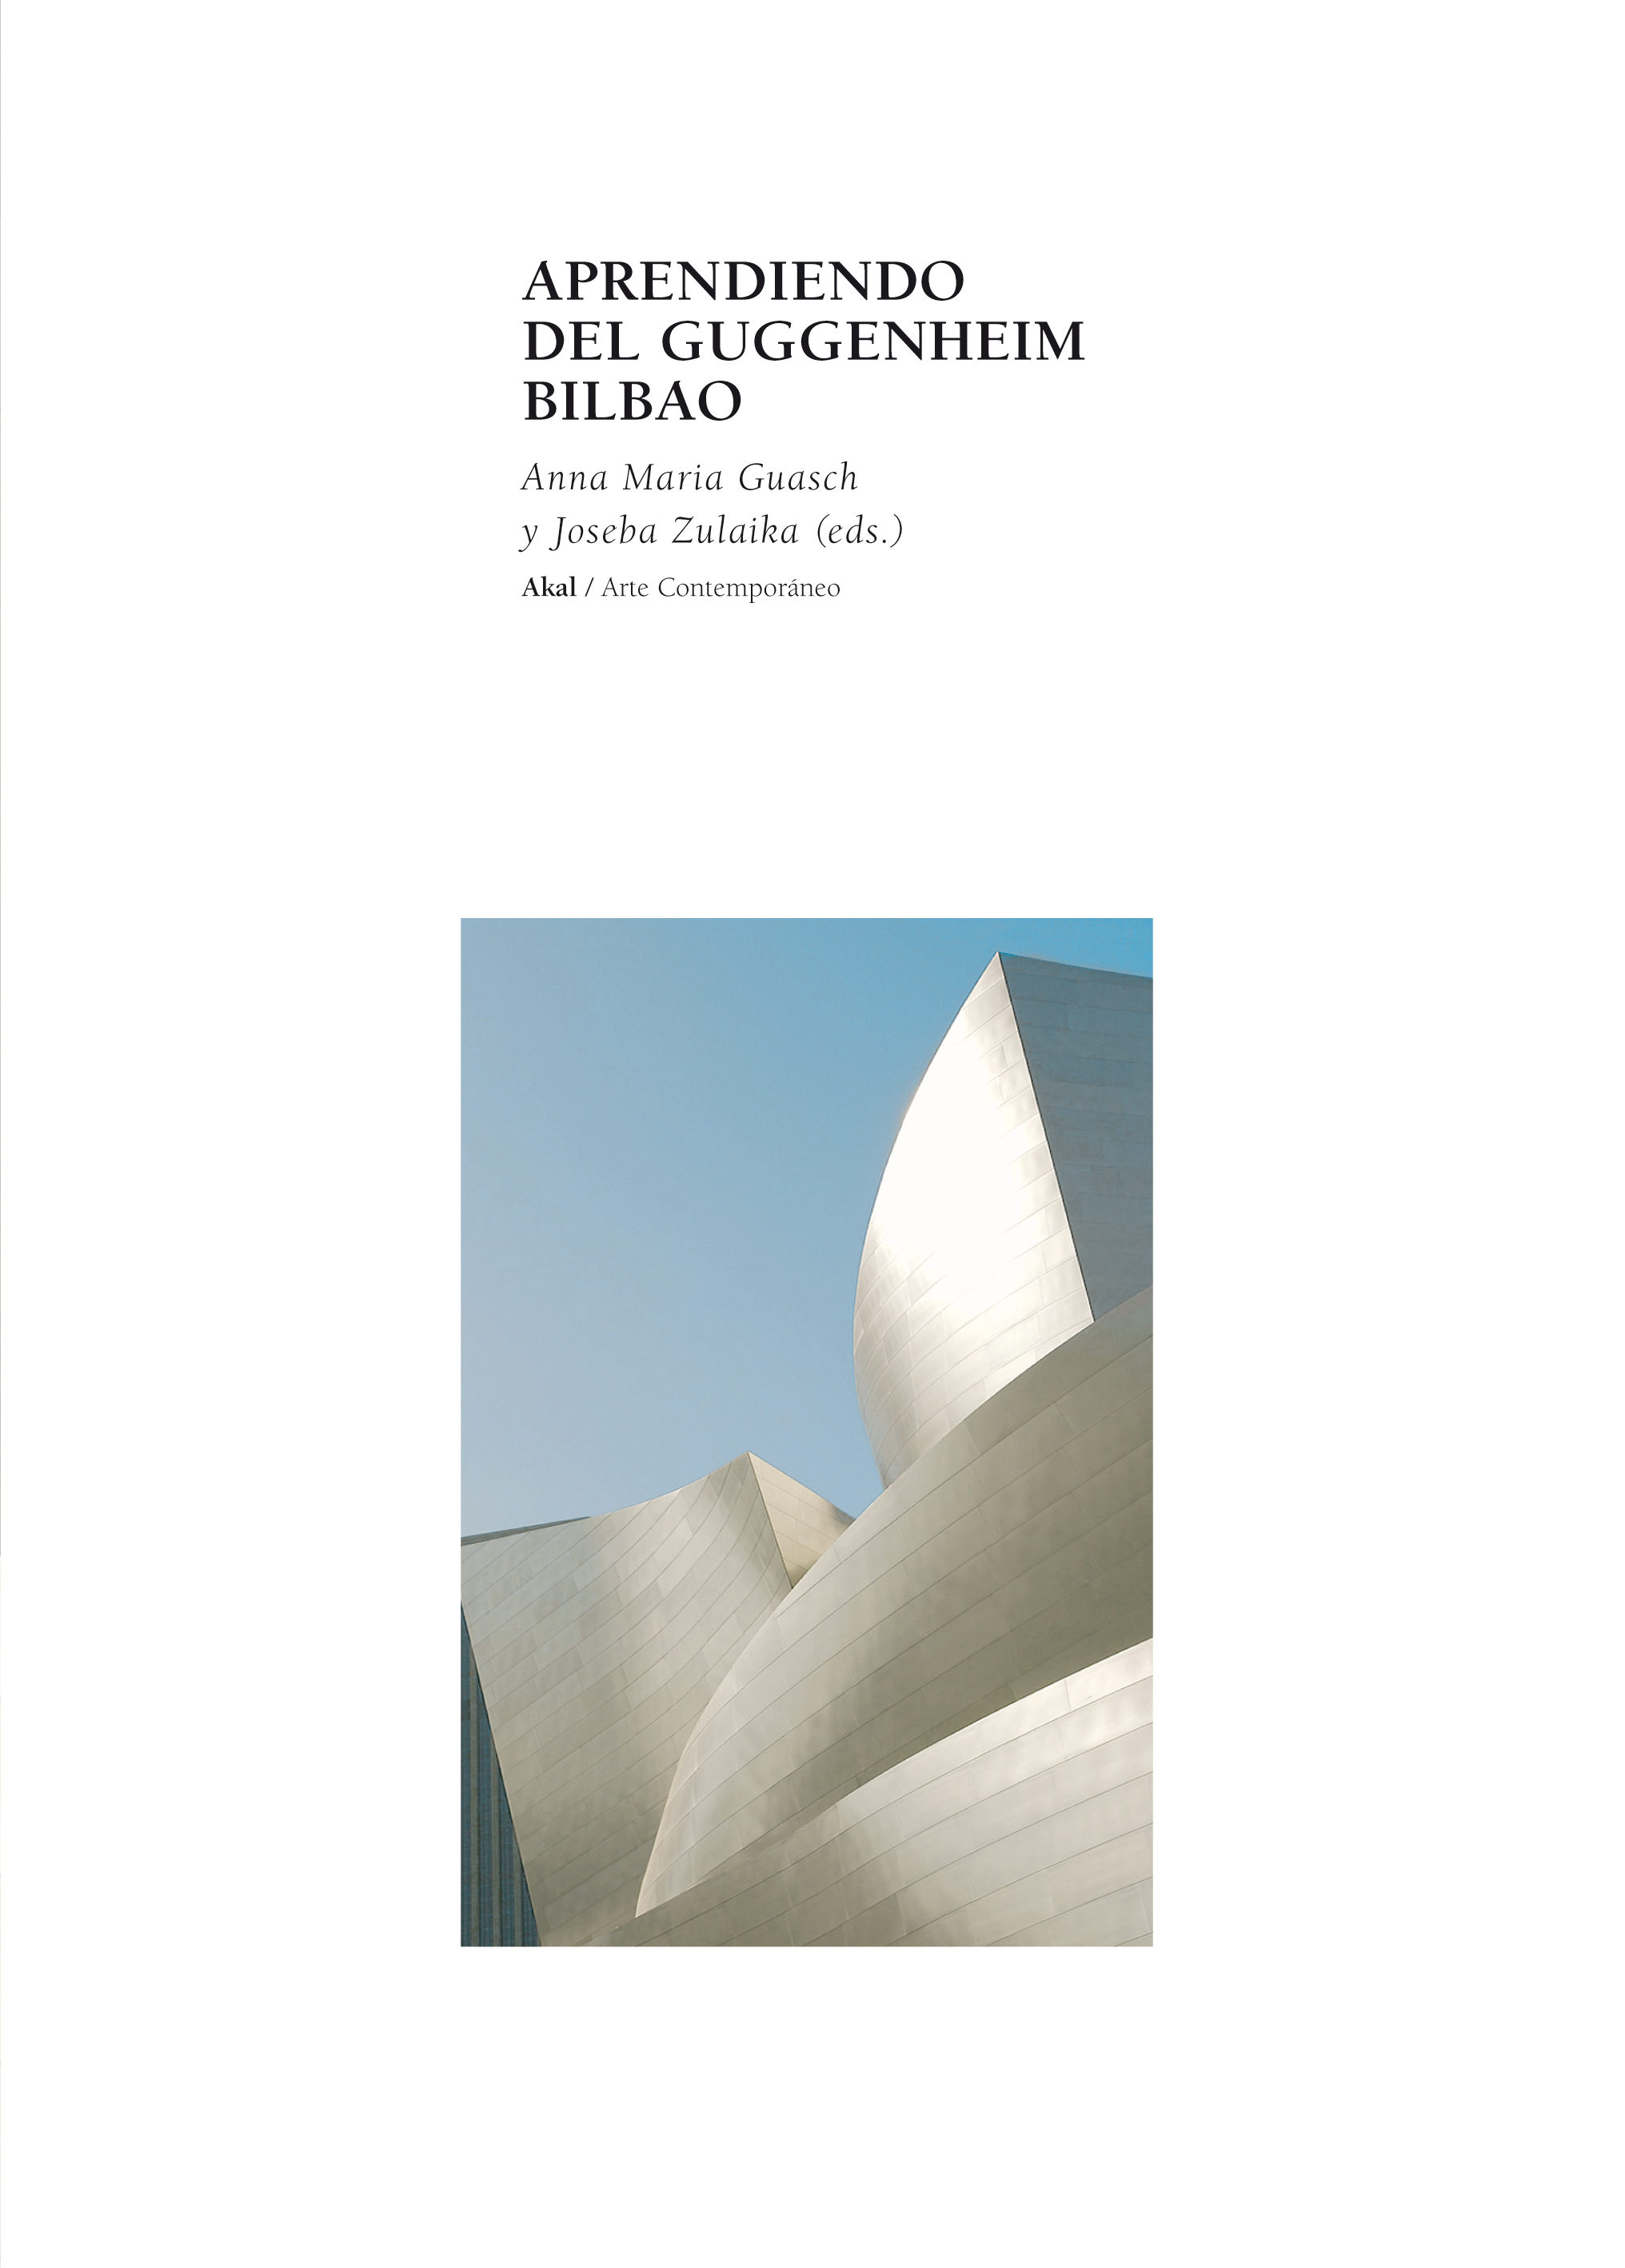 Aprendiendo Del Guggenheim Bilbao - Zulaika Irureta Joseba